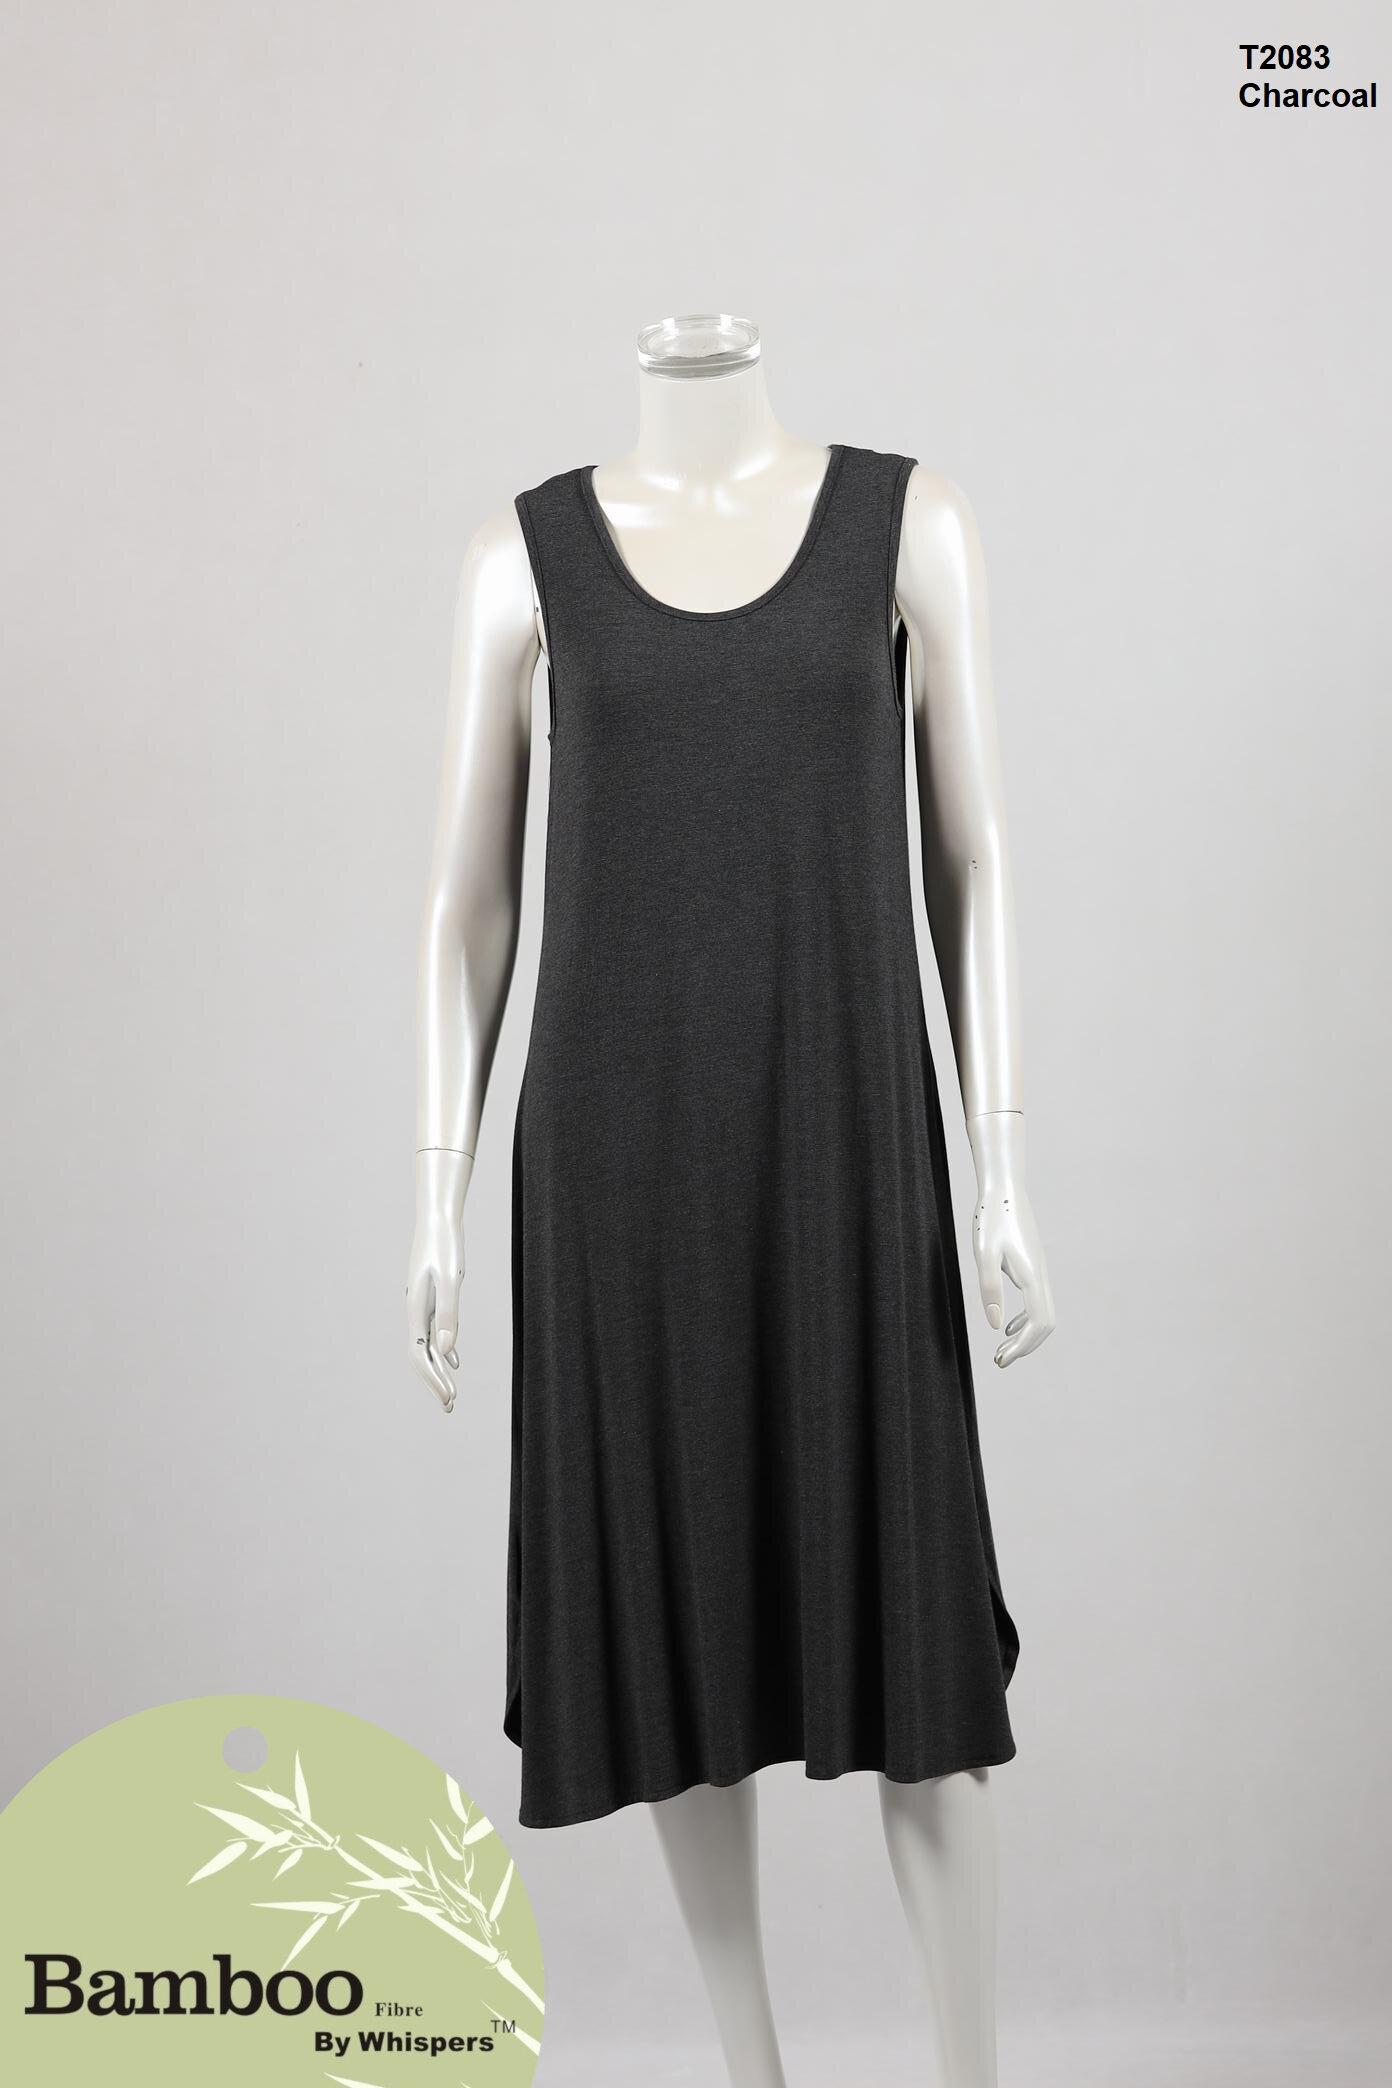 T2083-Bamboo Dress-Charcoal.JPG